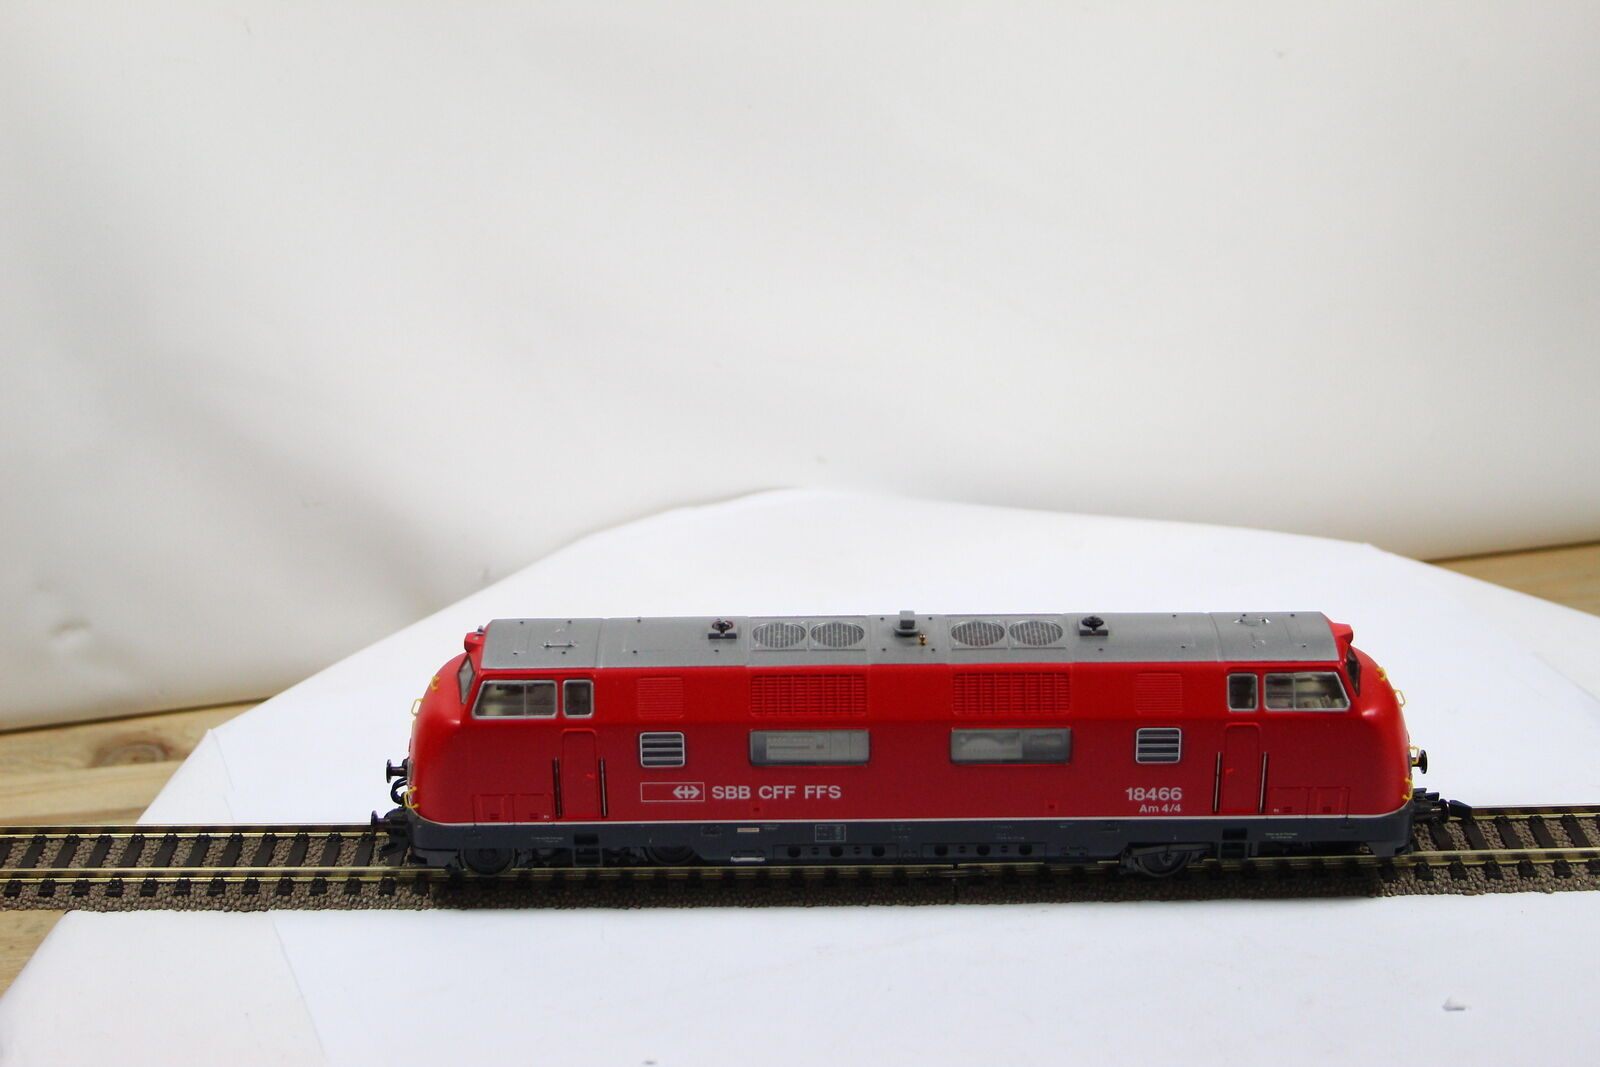 Roco Locomotora Diésel 18466 SBB   Cff   Ffs Rojo Escala H0 Pesada Lok